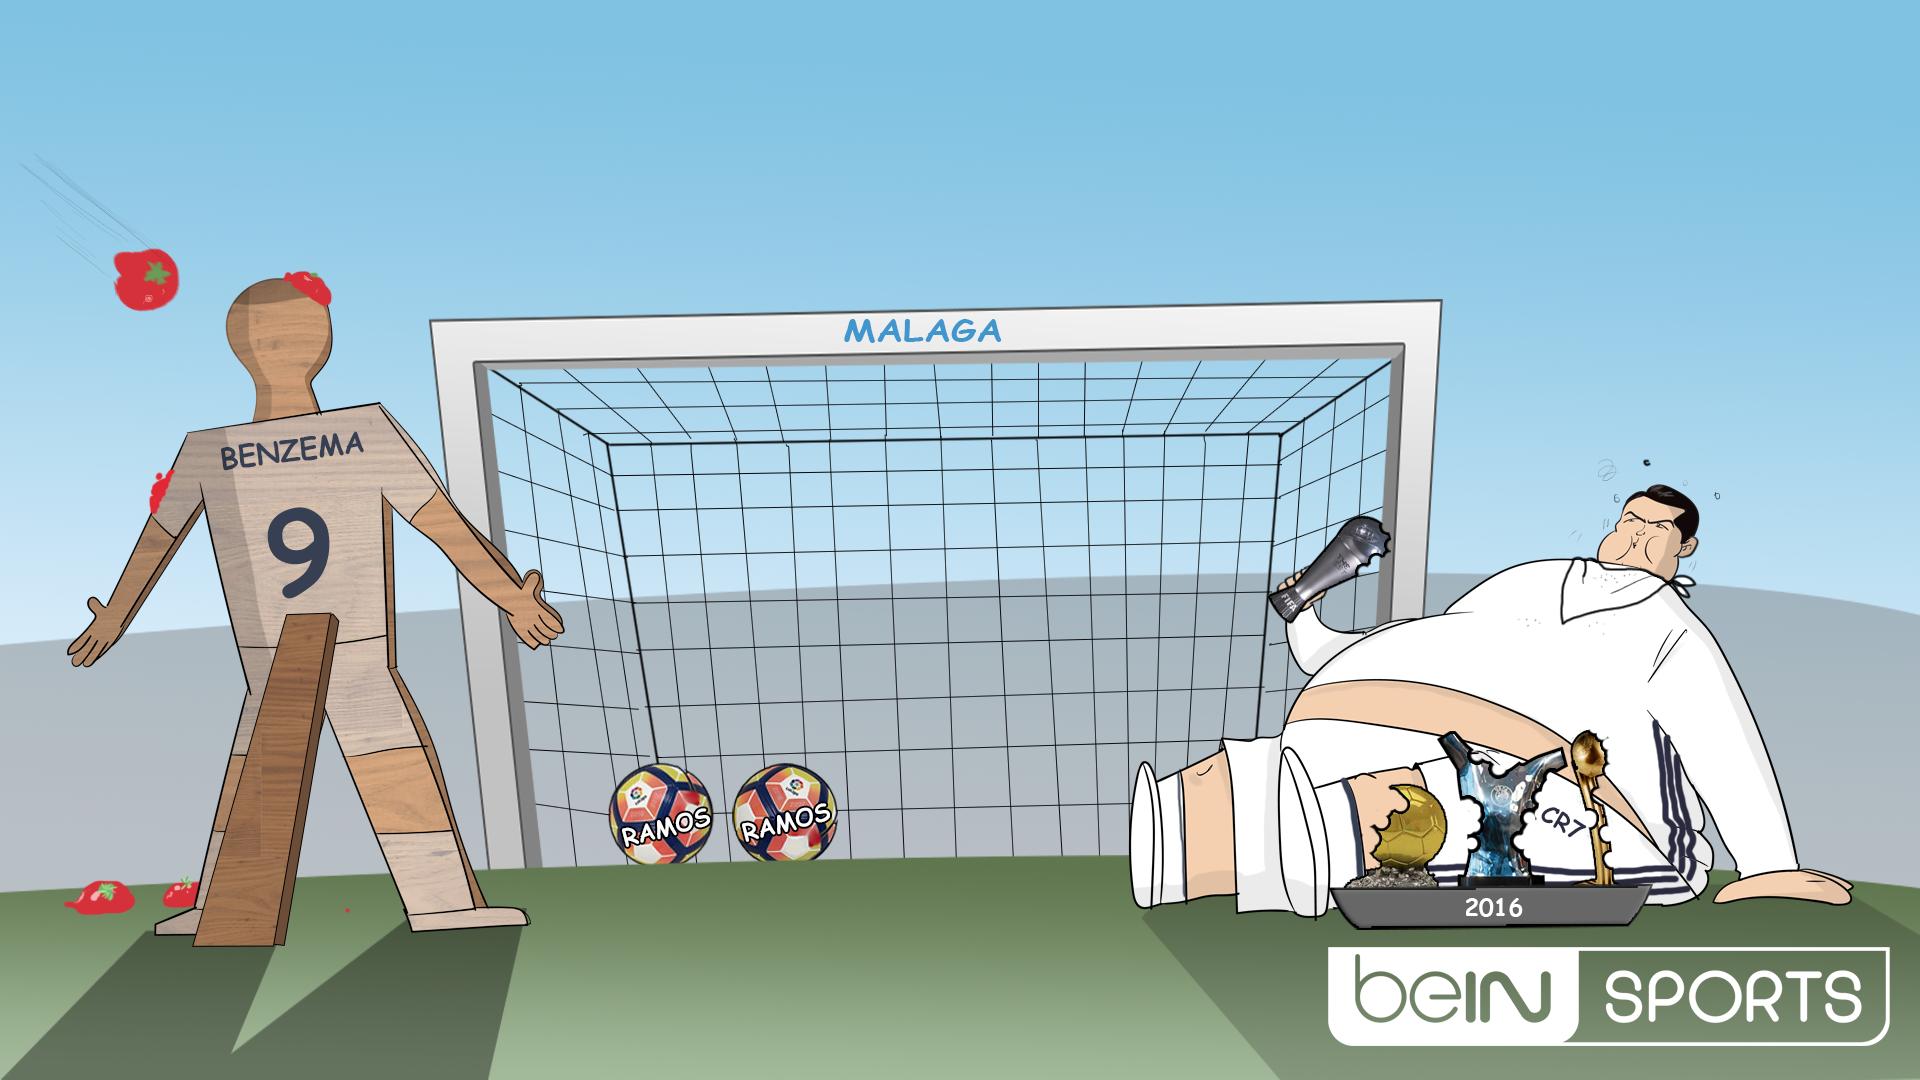 كاريكاتور ساديو ماني ي سقط السنغال وليفربول معا Bein Sports Bein Sports Fictional Characters Character